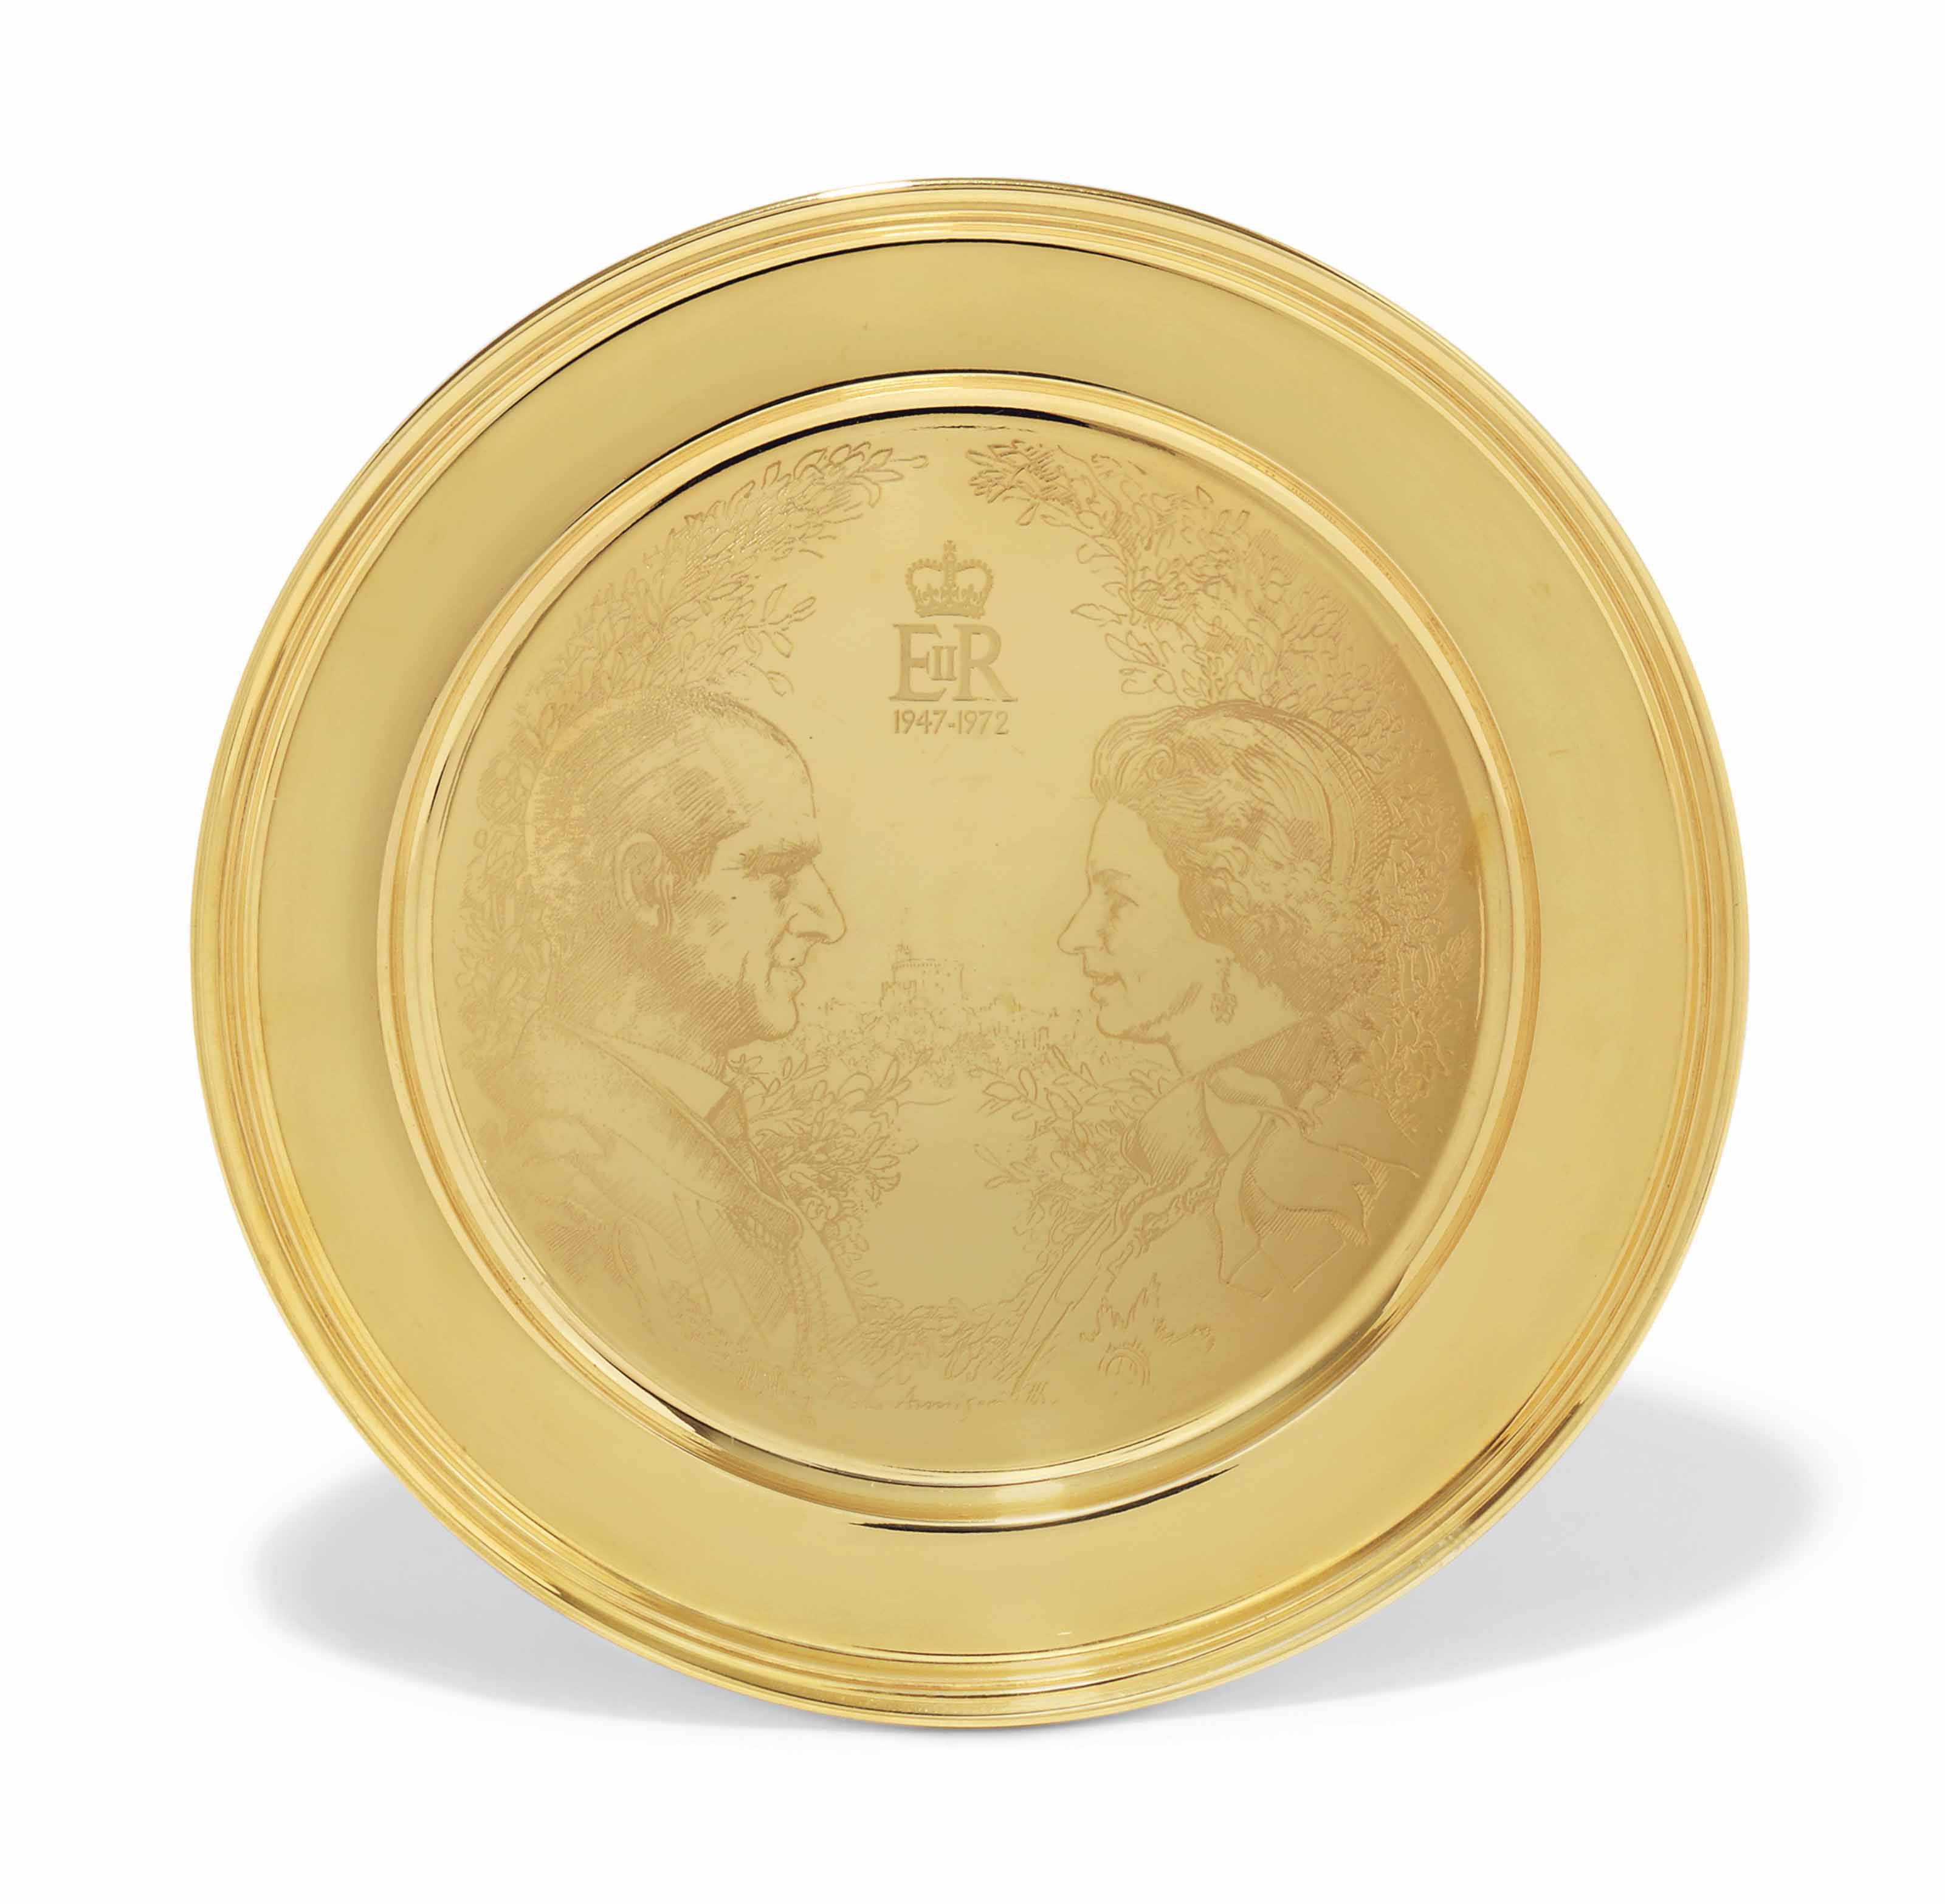 AN ELIZABETH II GOLD COMMEMORATIVE PLATE